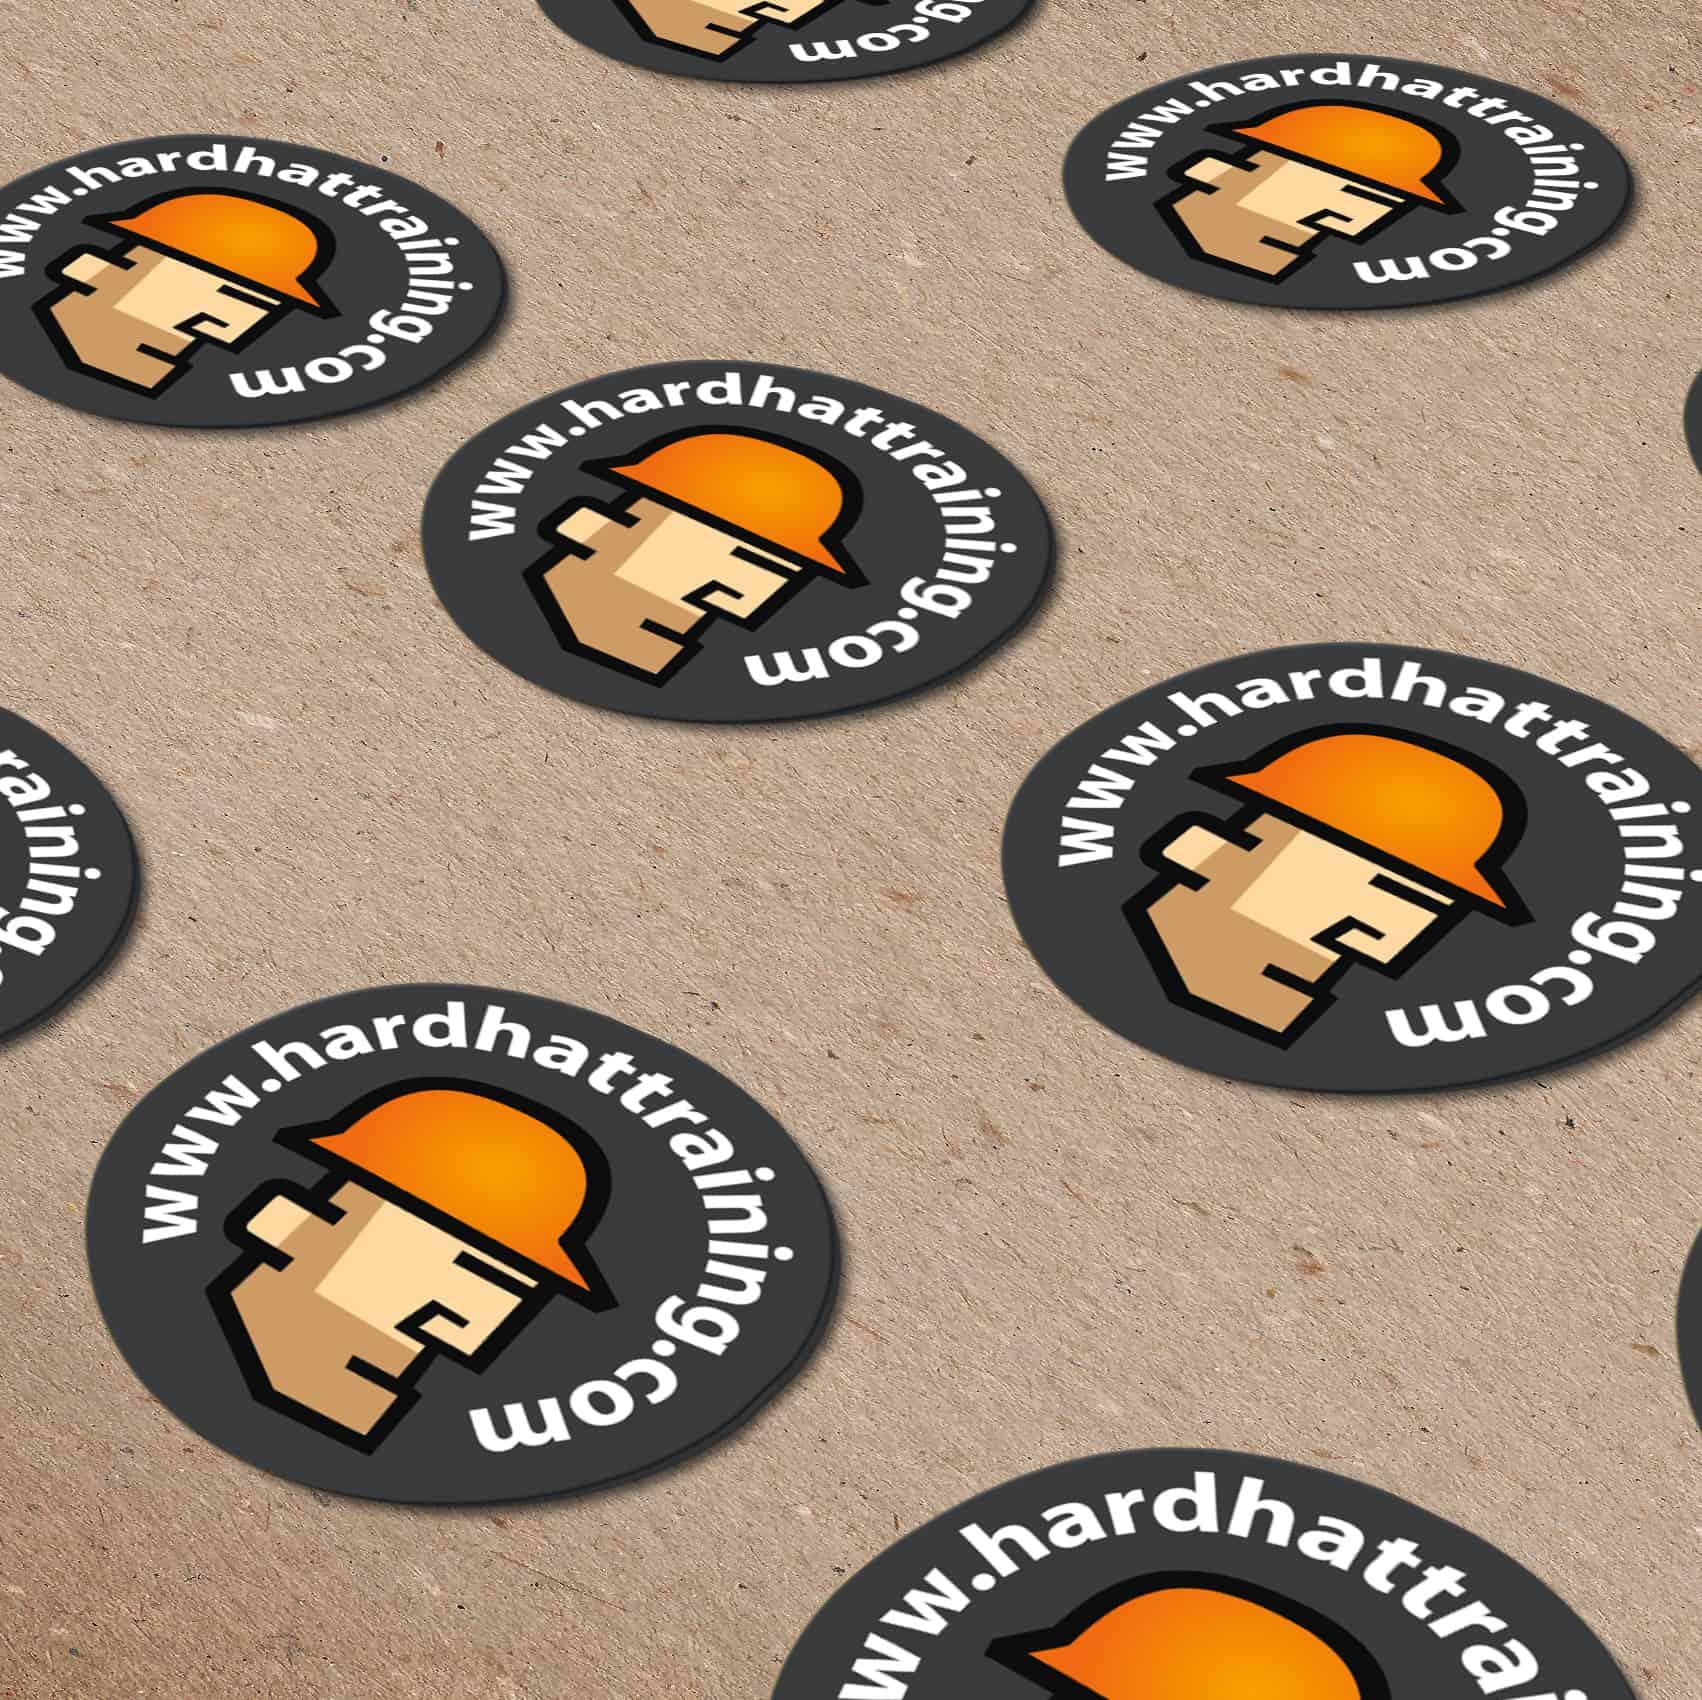 hard hat training stickers